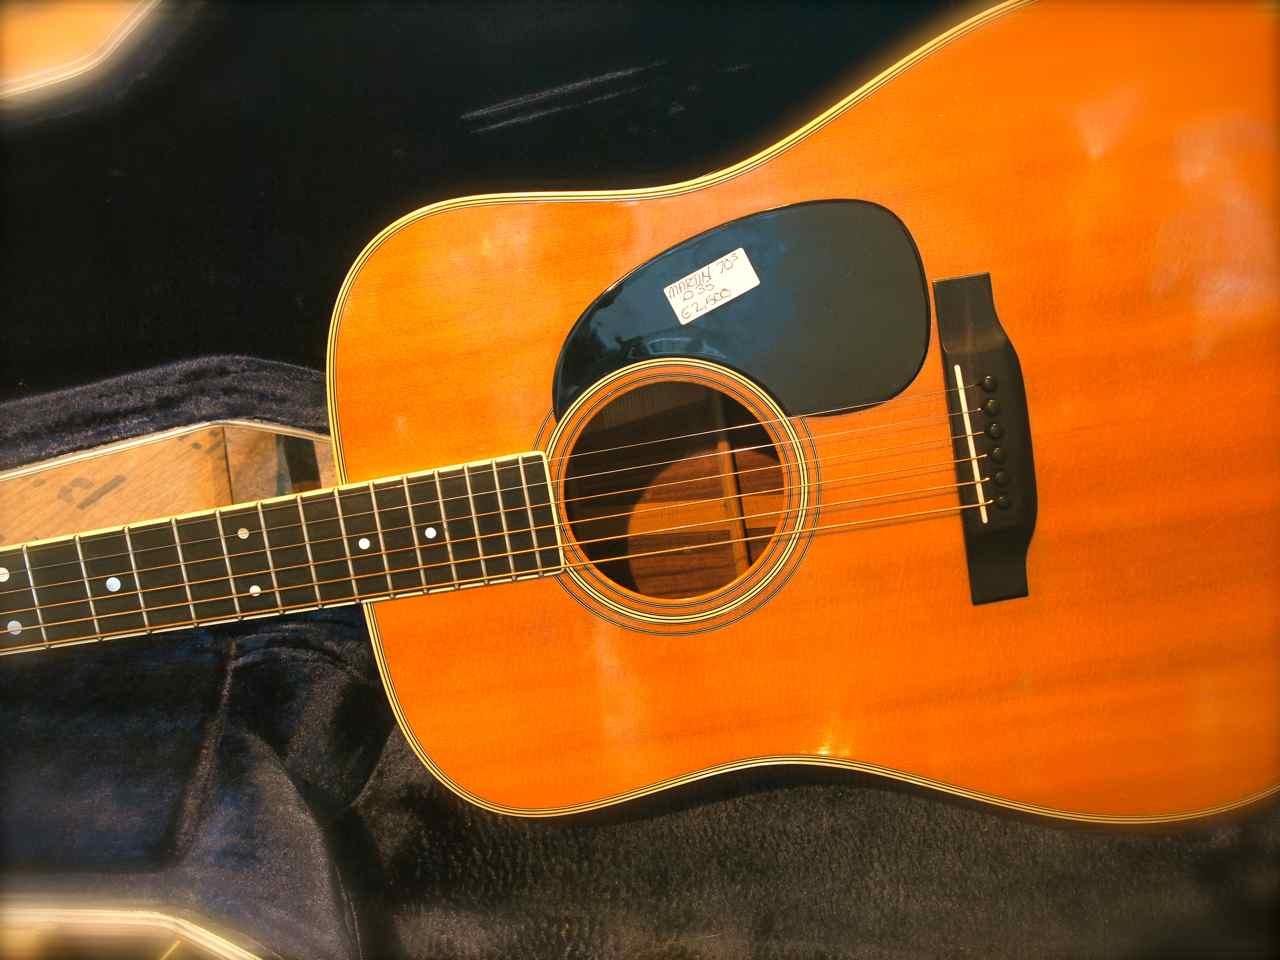 martin d 35 2014 natural guitar for sale beat it music. Black Bedroom Furniture Sets. Home Design Ideas